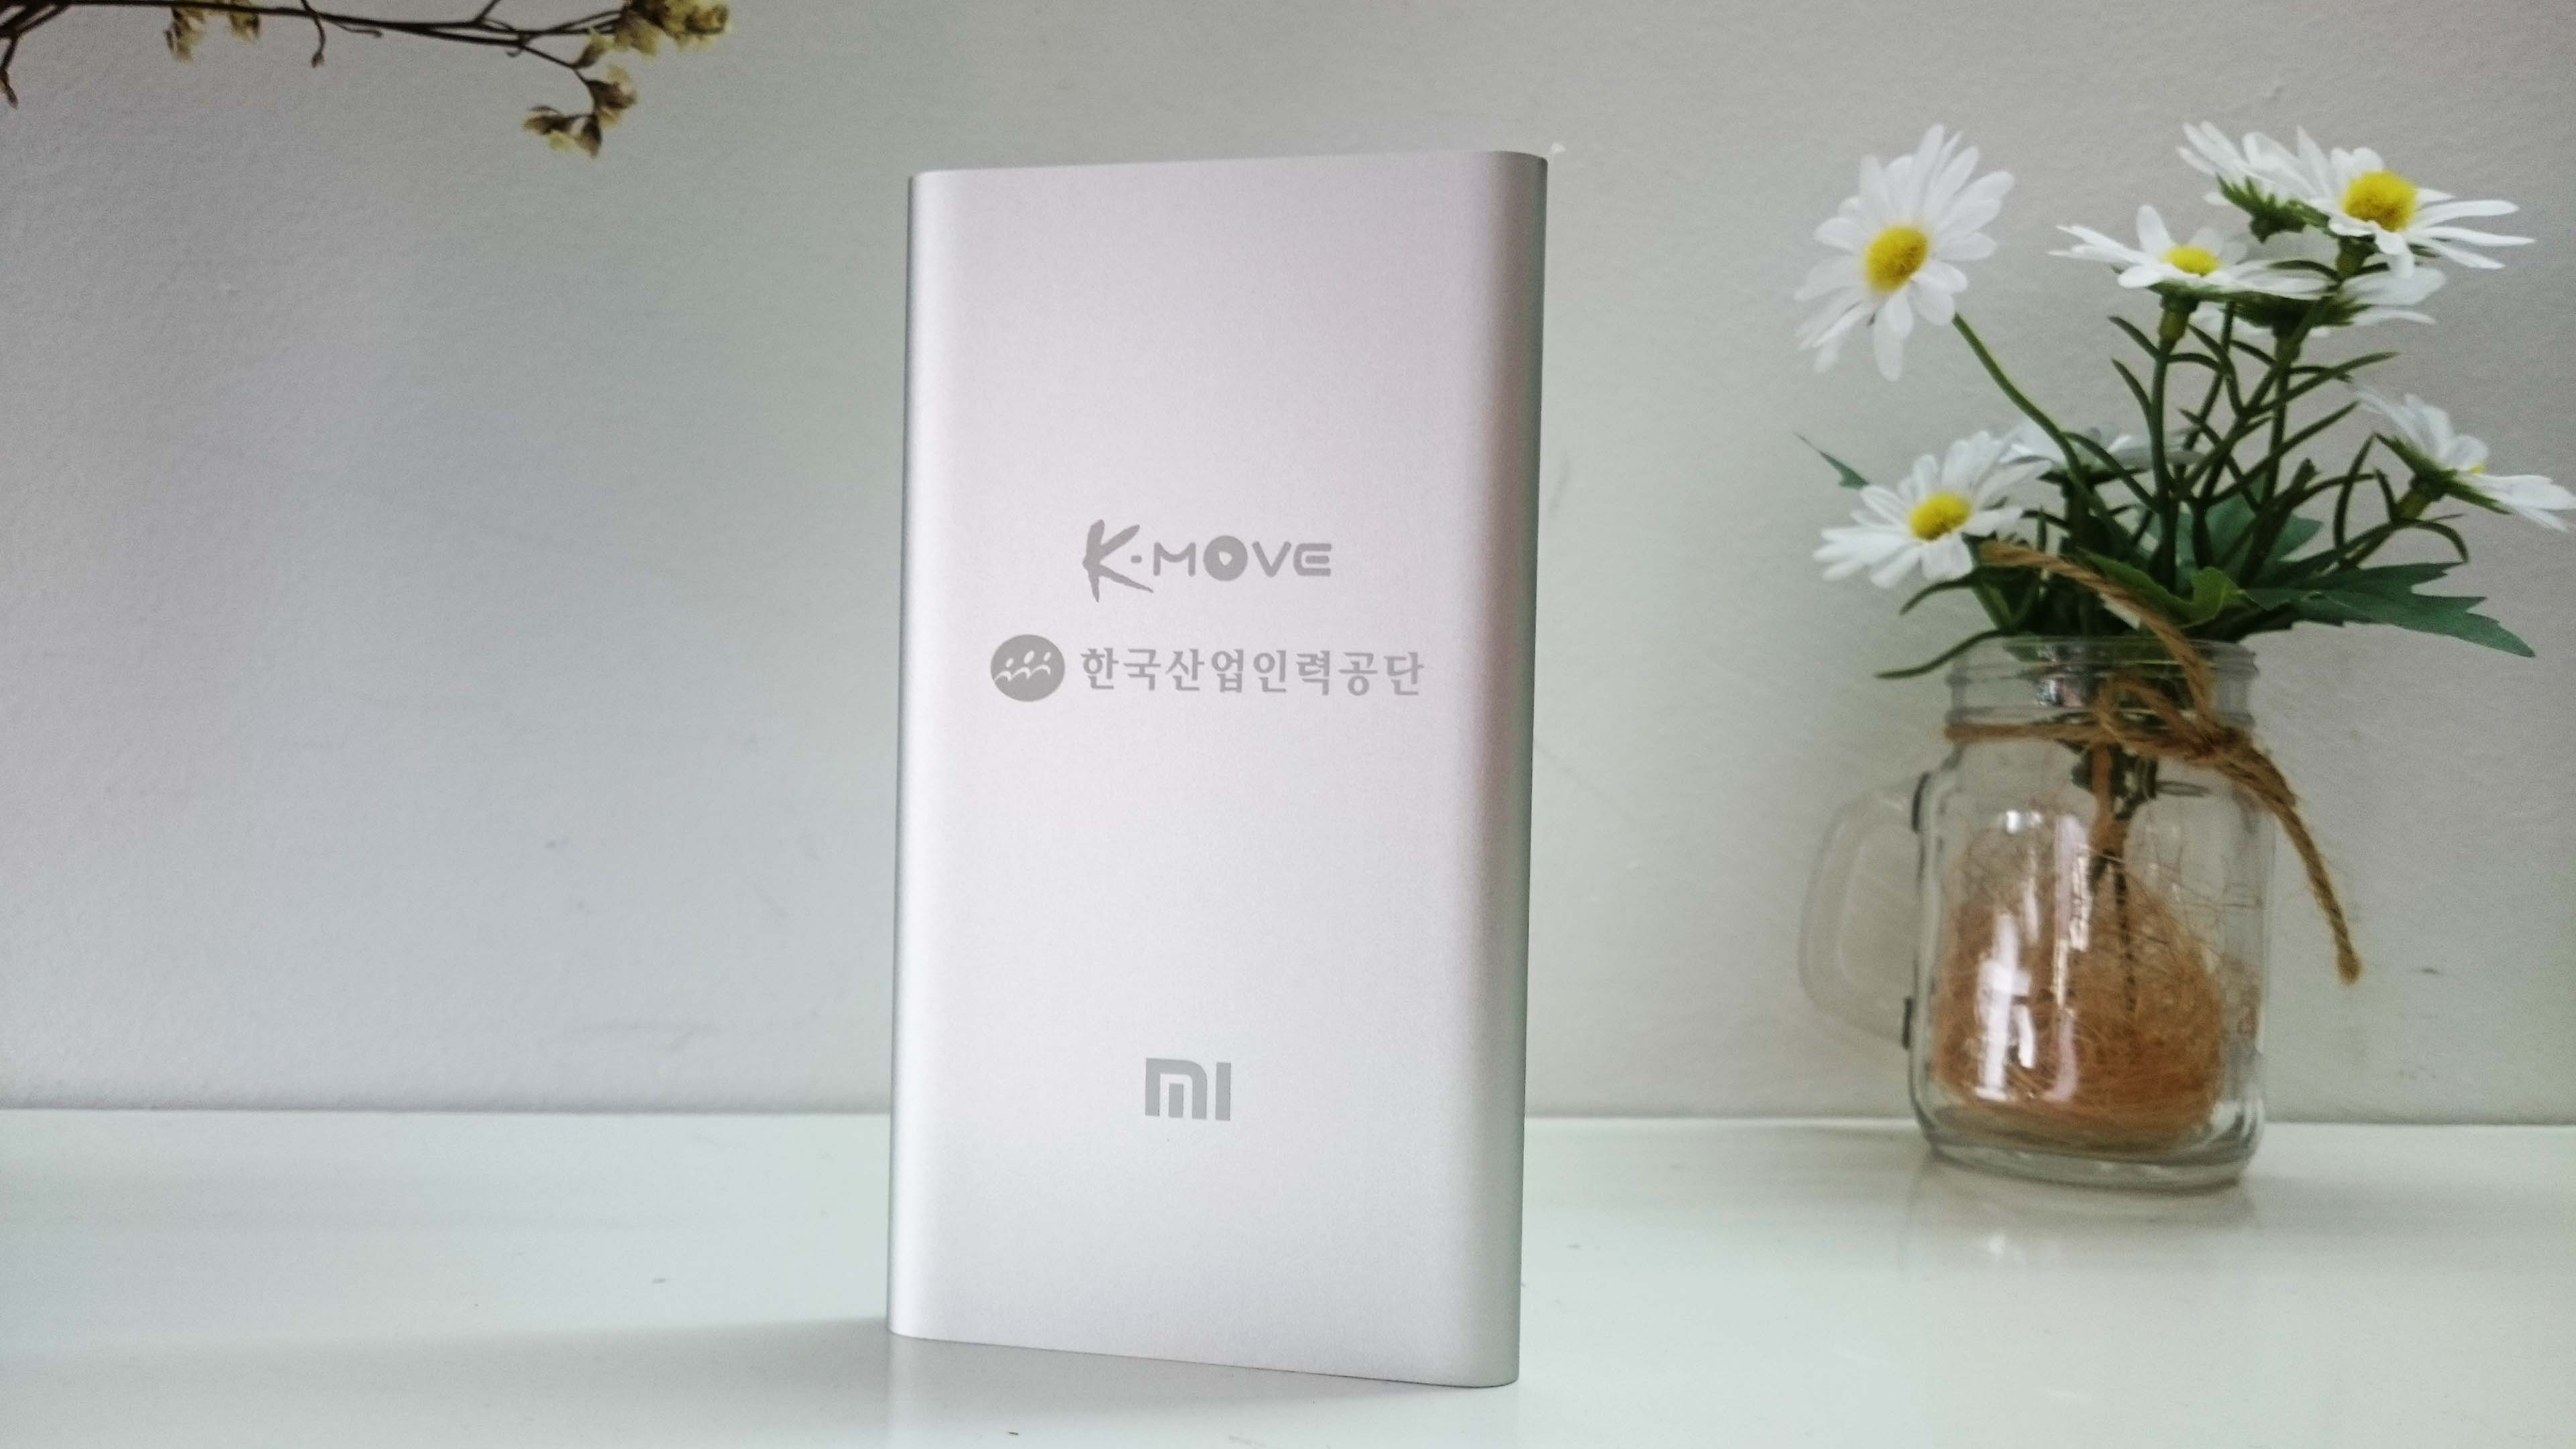 Pin sac du phong Xiaomi 5000mAh Kmove